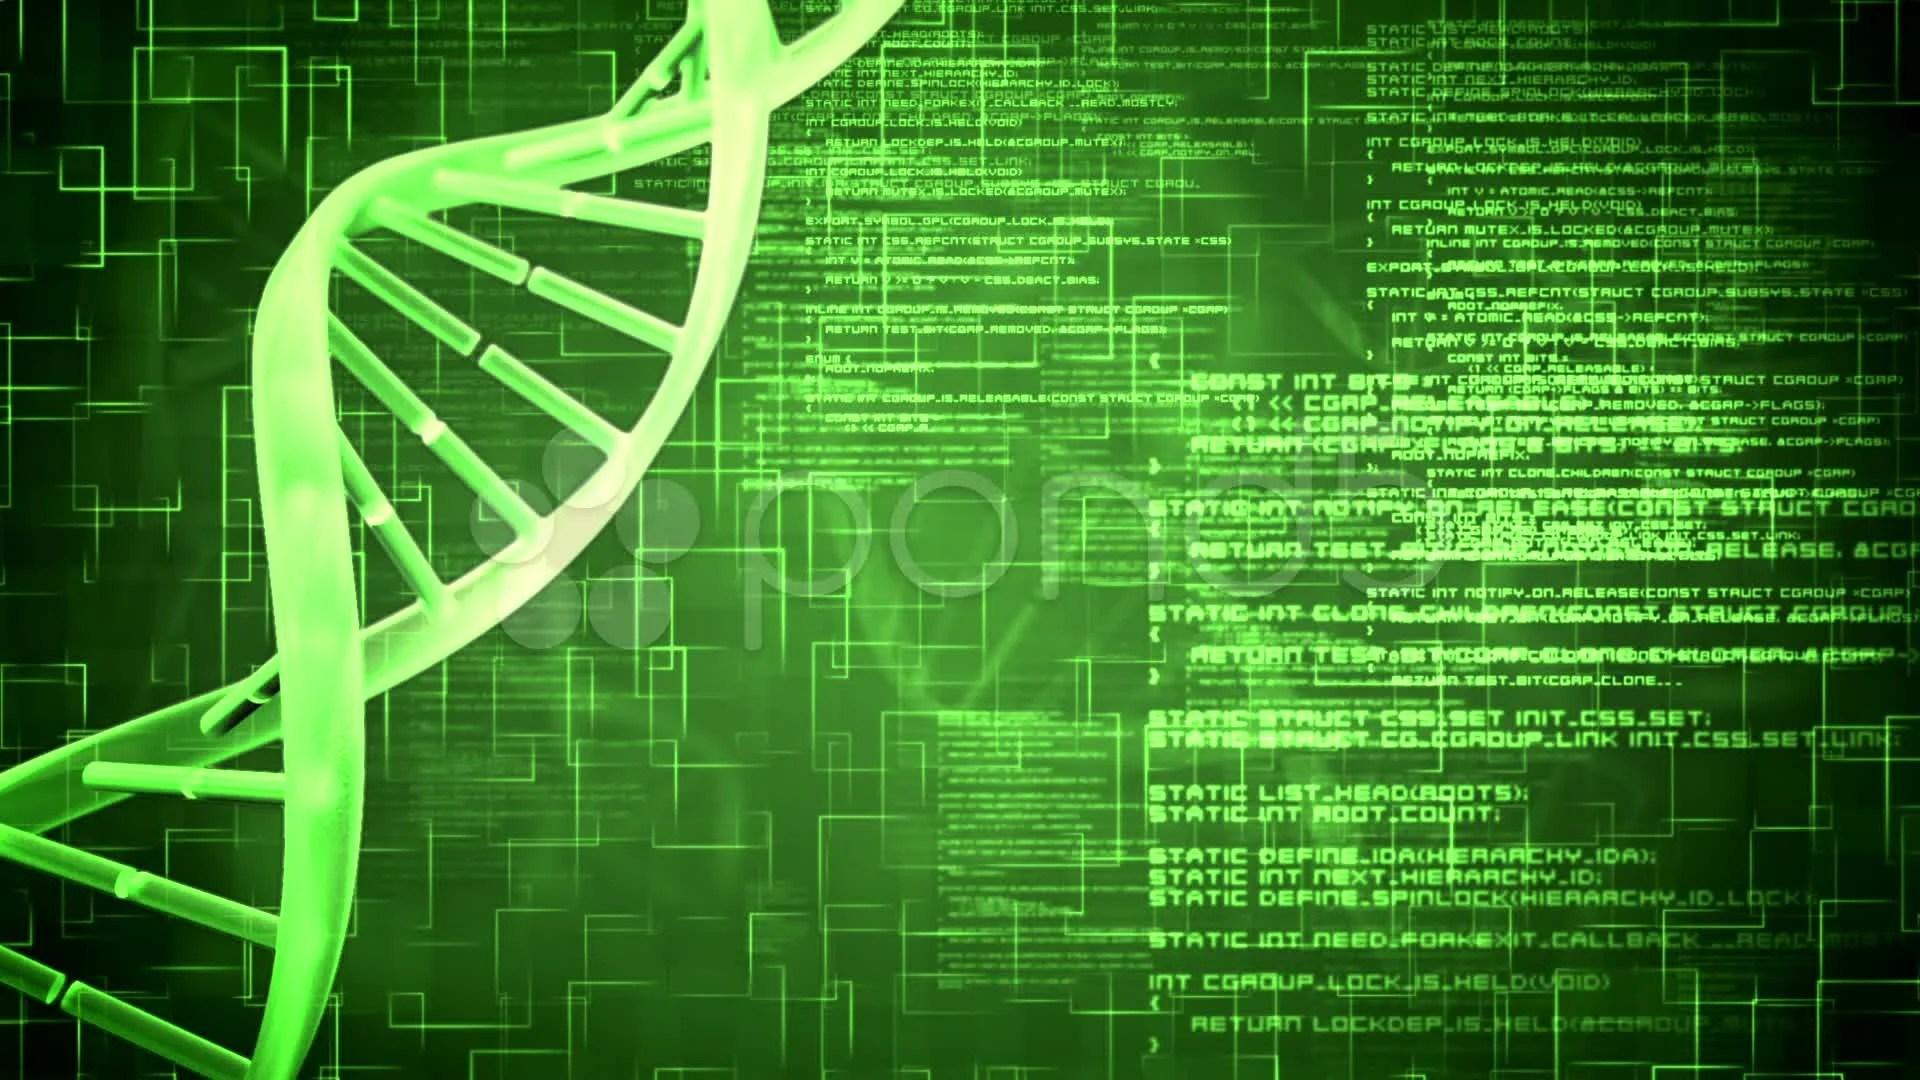 Amd Human Genetics Patterns Of Heredity Worksheet